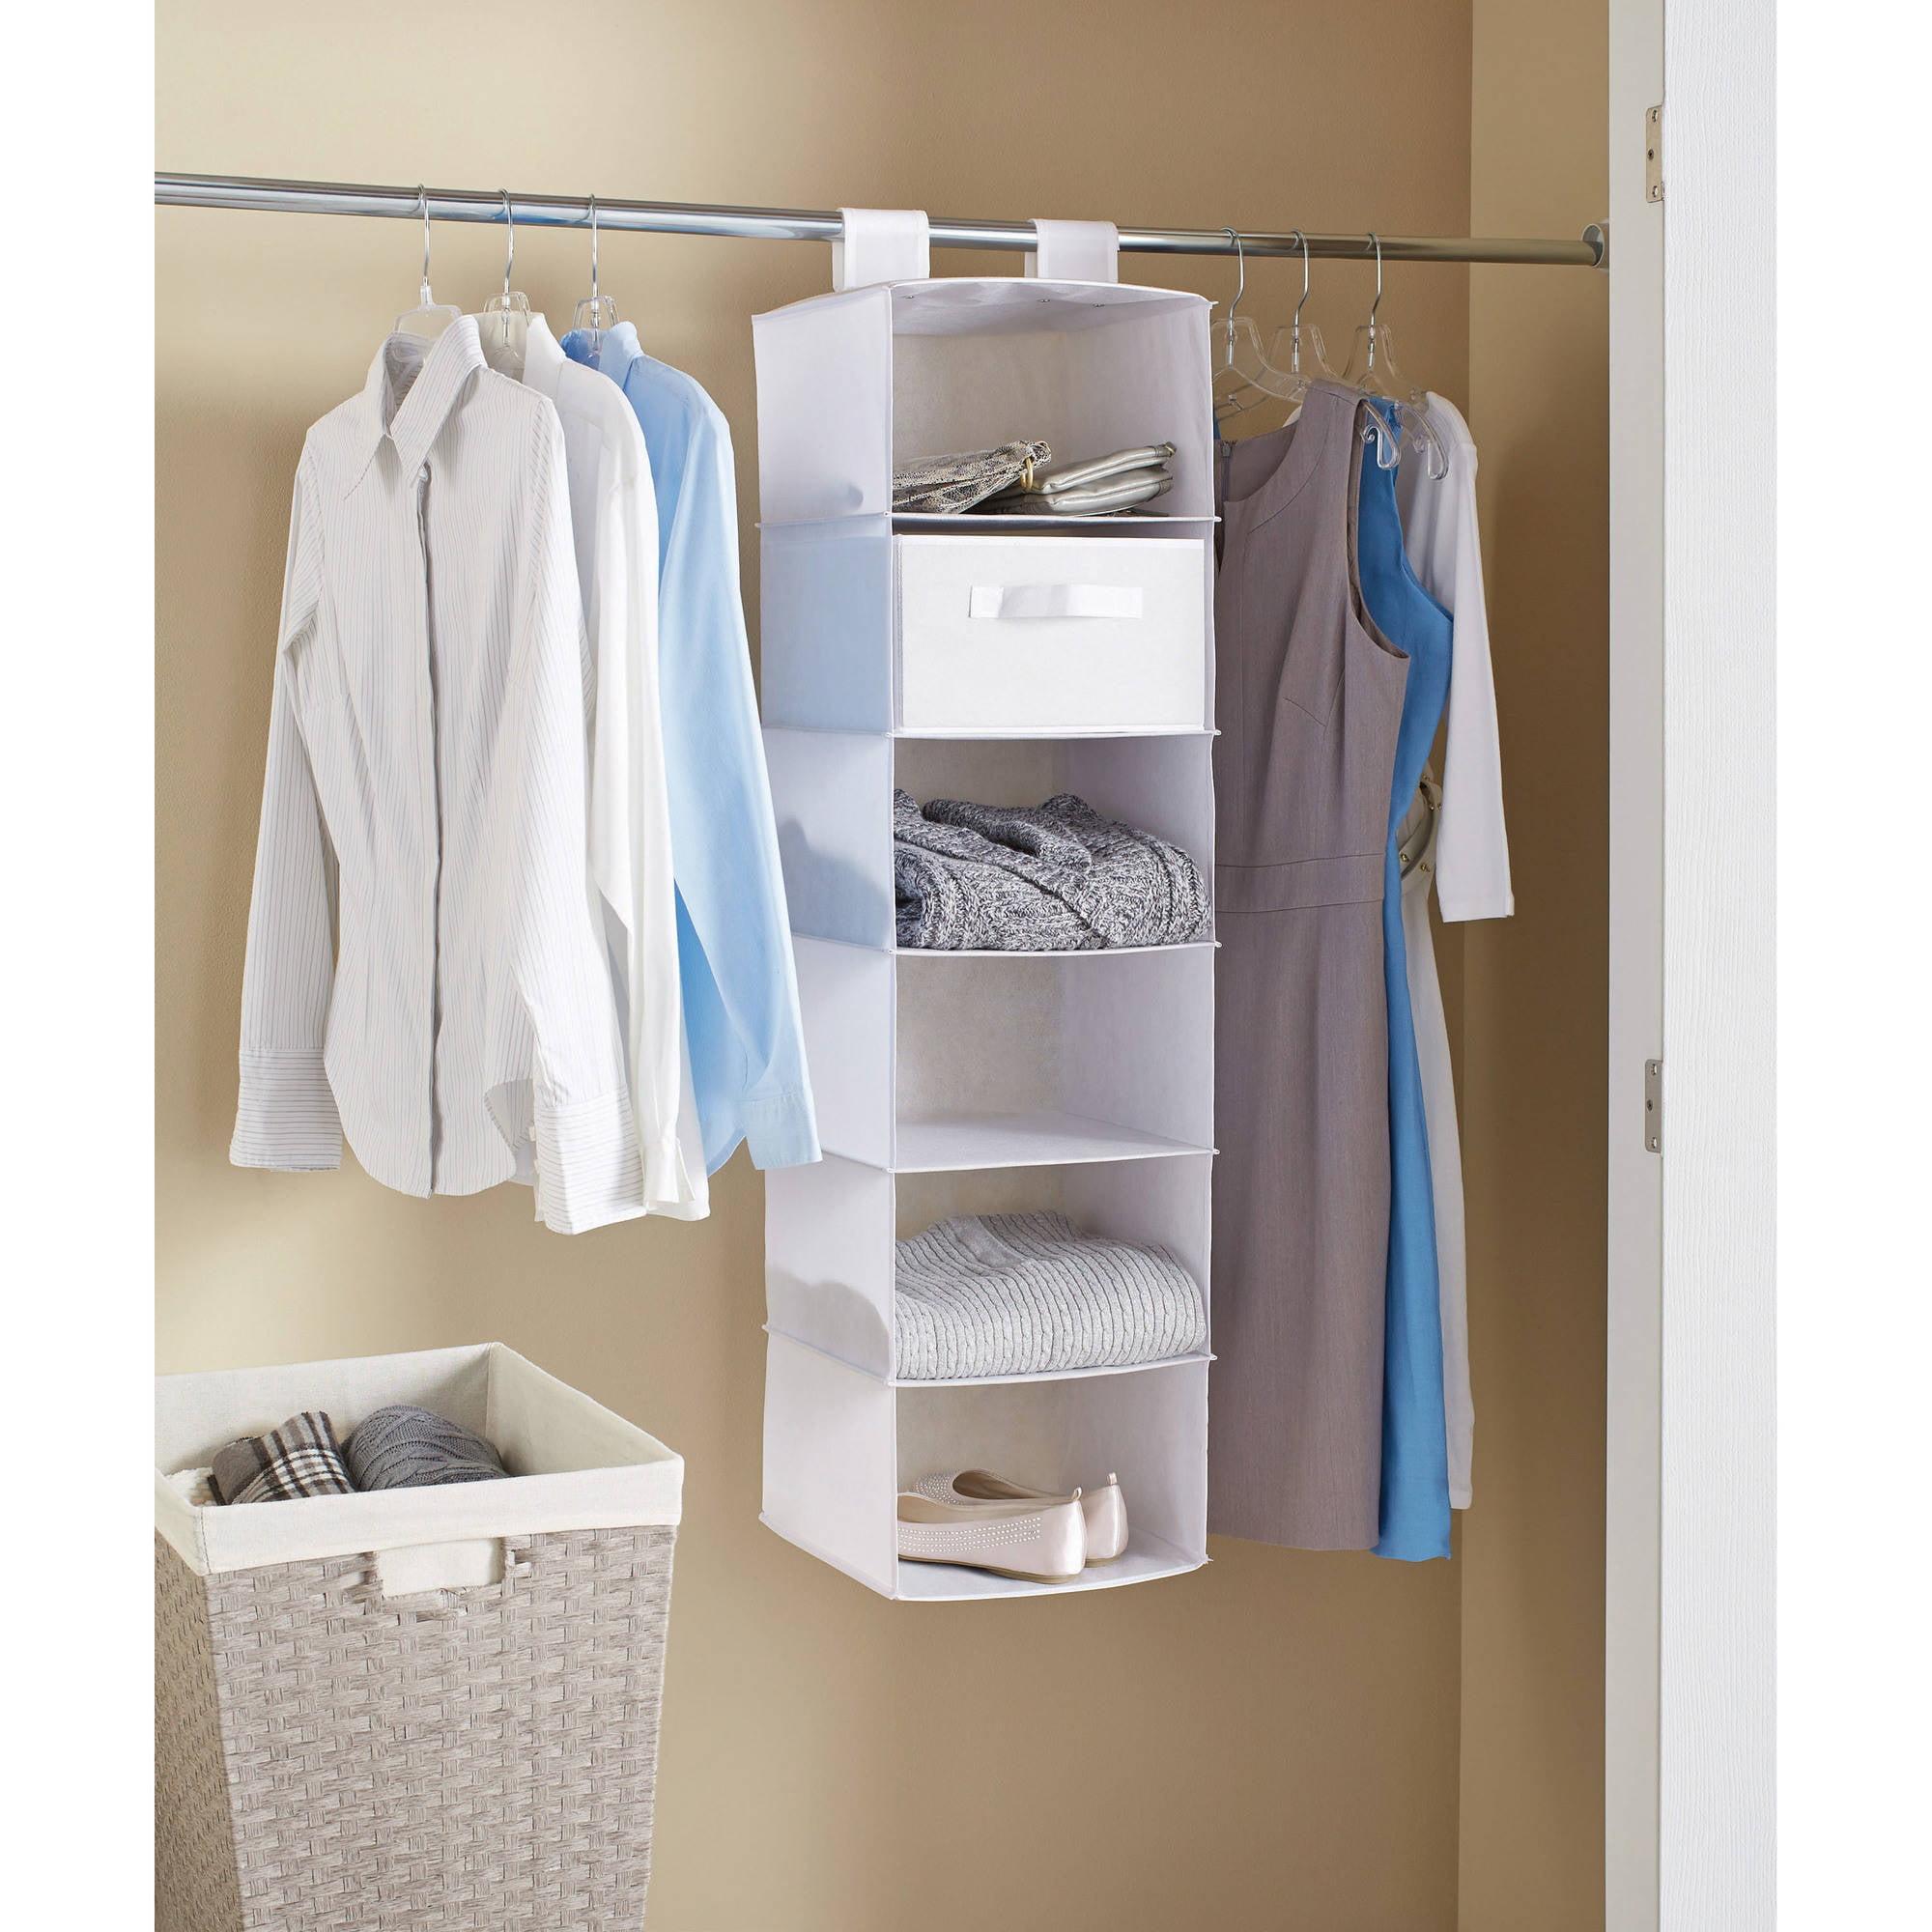 Mainstays 6-Shelf Organizer, 2-Pack